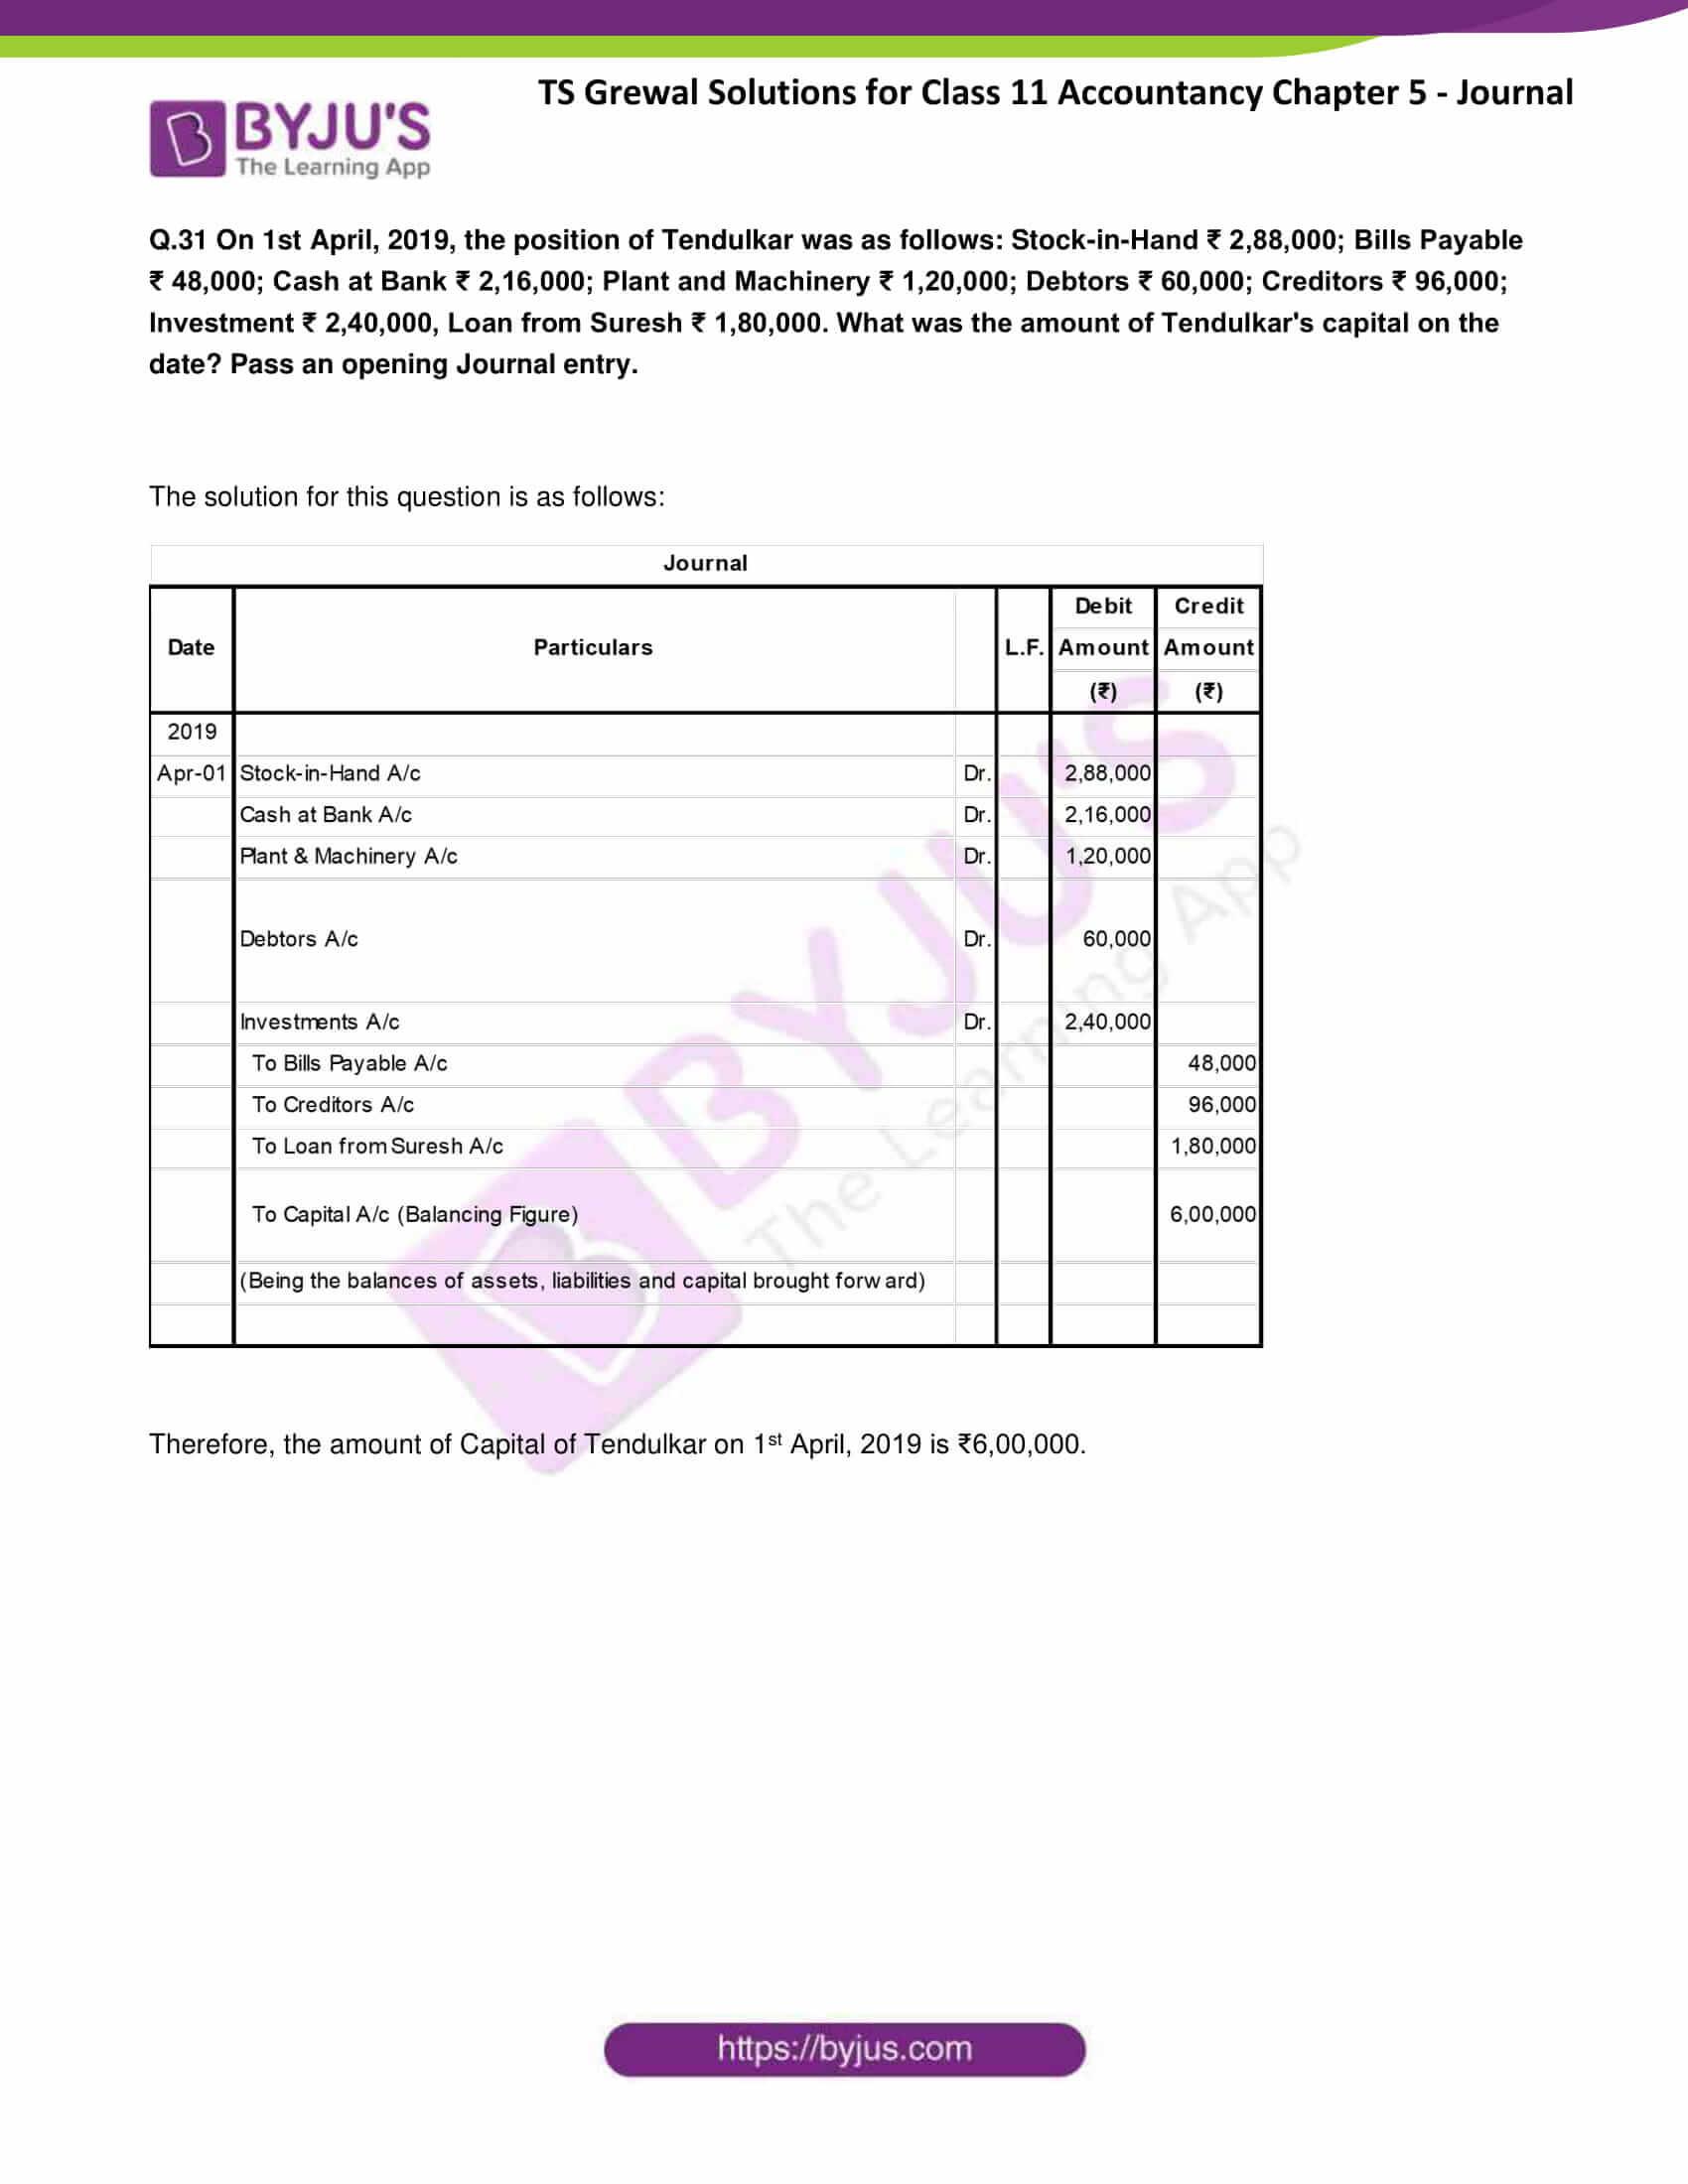 ts grewal class 11 accountancy chapter 5 journal 45